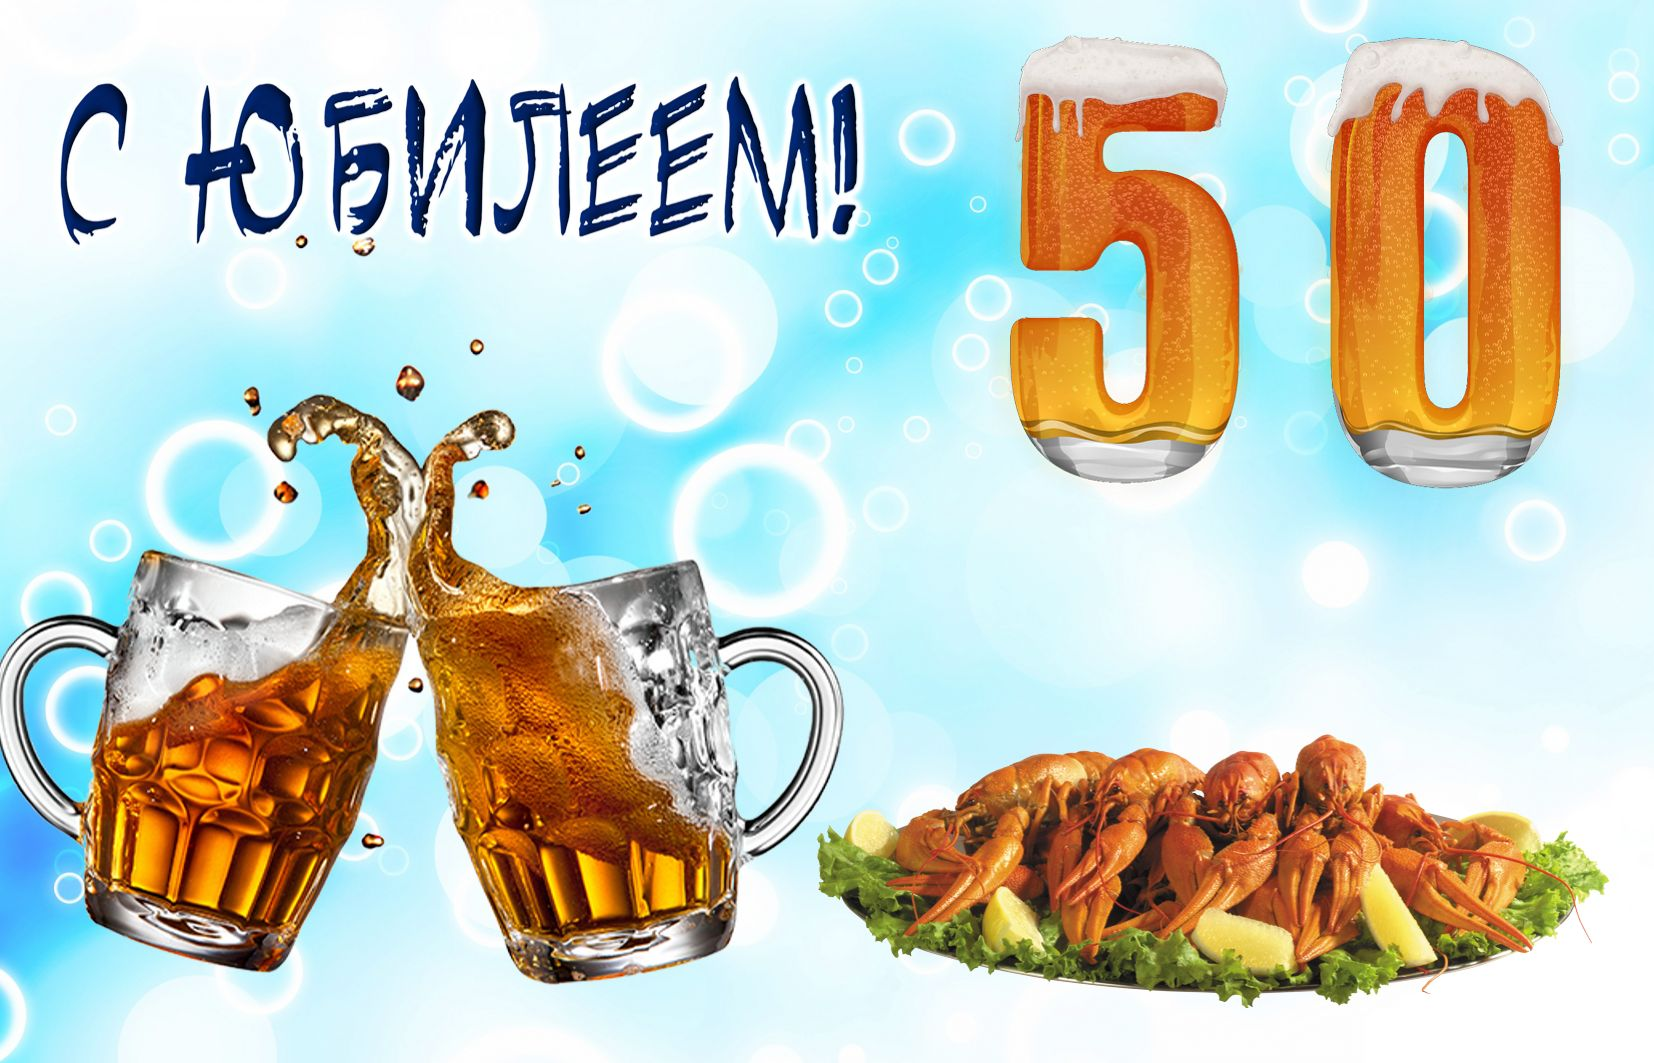 Открытка на юбилей 50 лет - кружки с пивом и раки на тарелочке